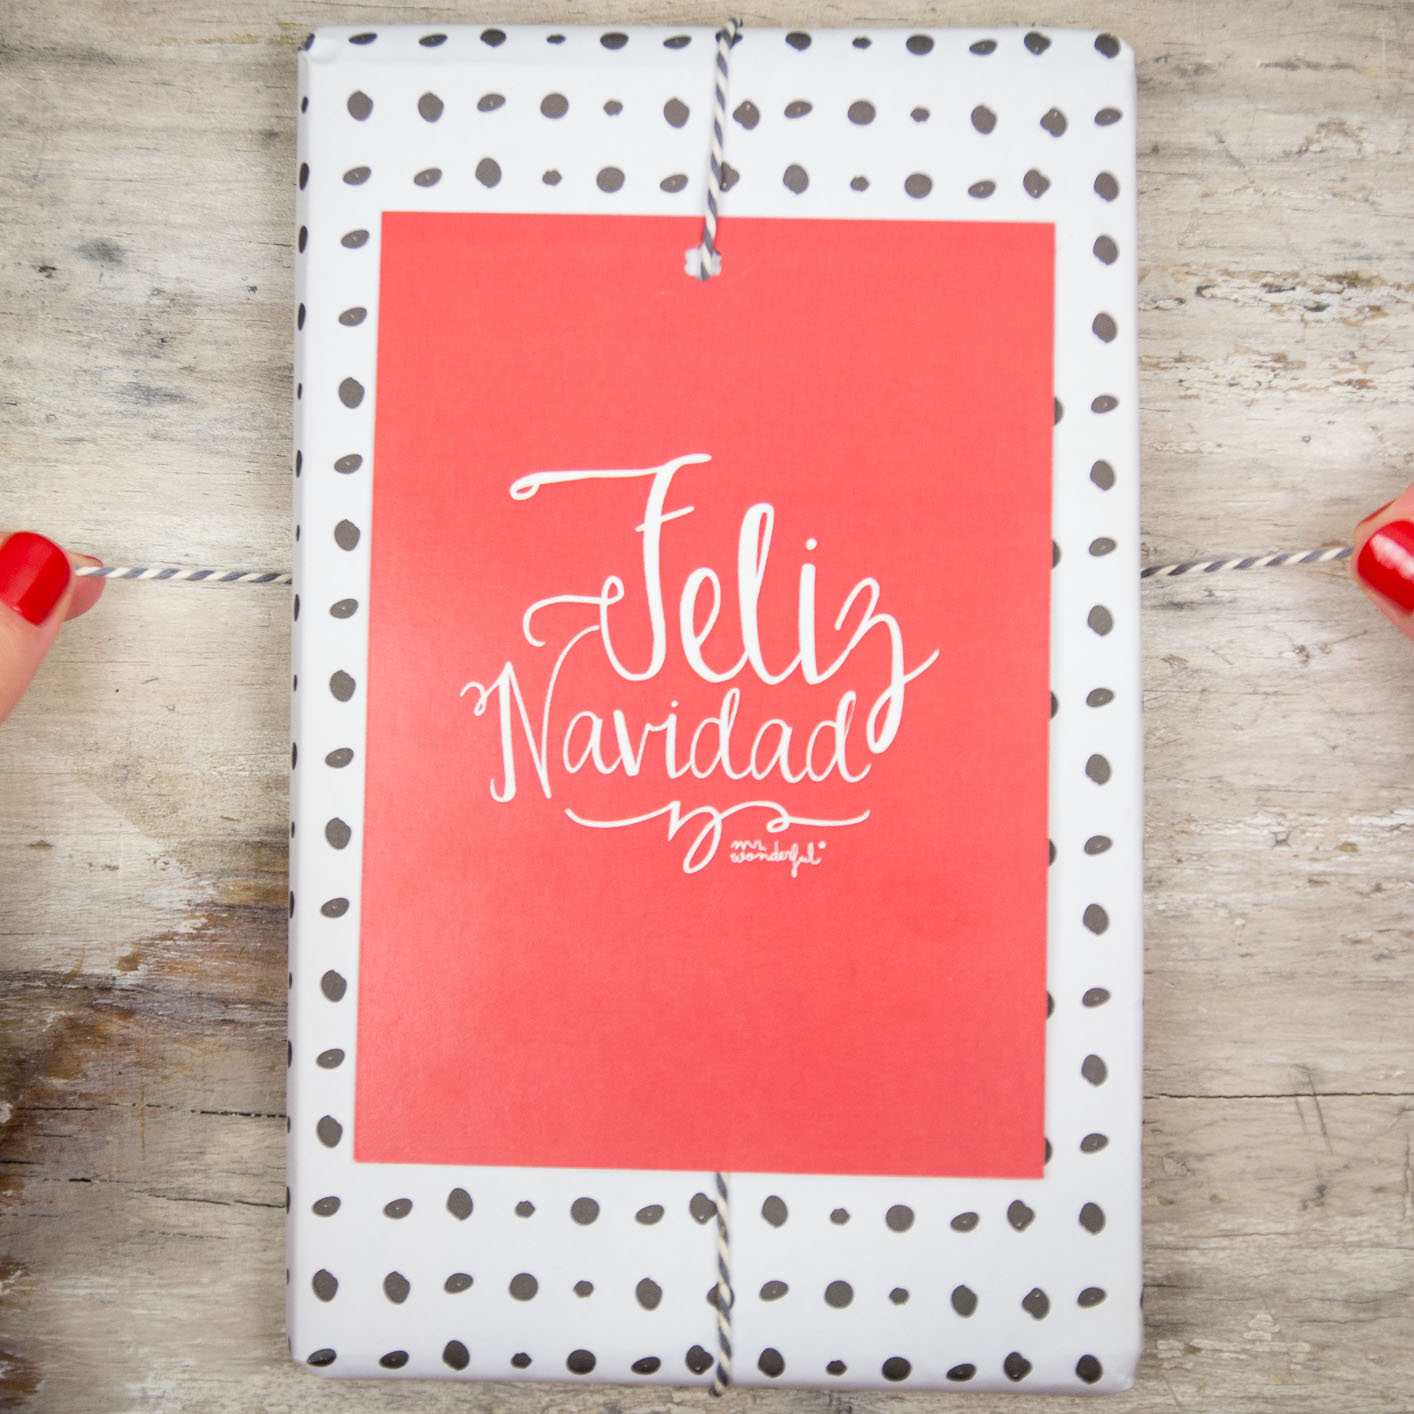 Mr_wonderful_tutorial_descargable_freebie_tarjeta_regalo_navidad_045